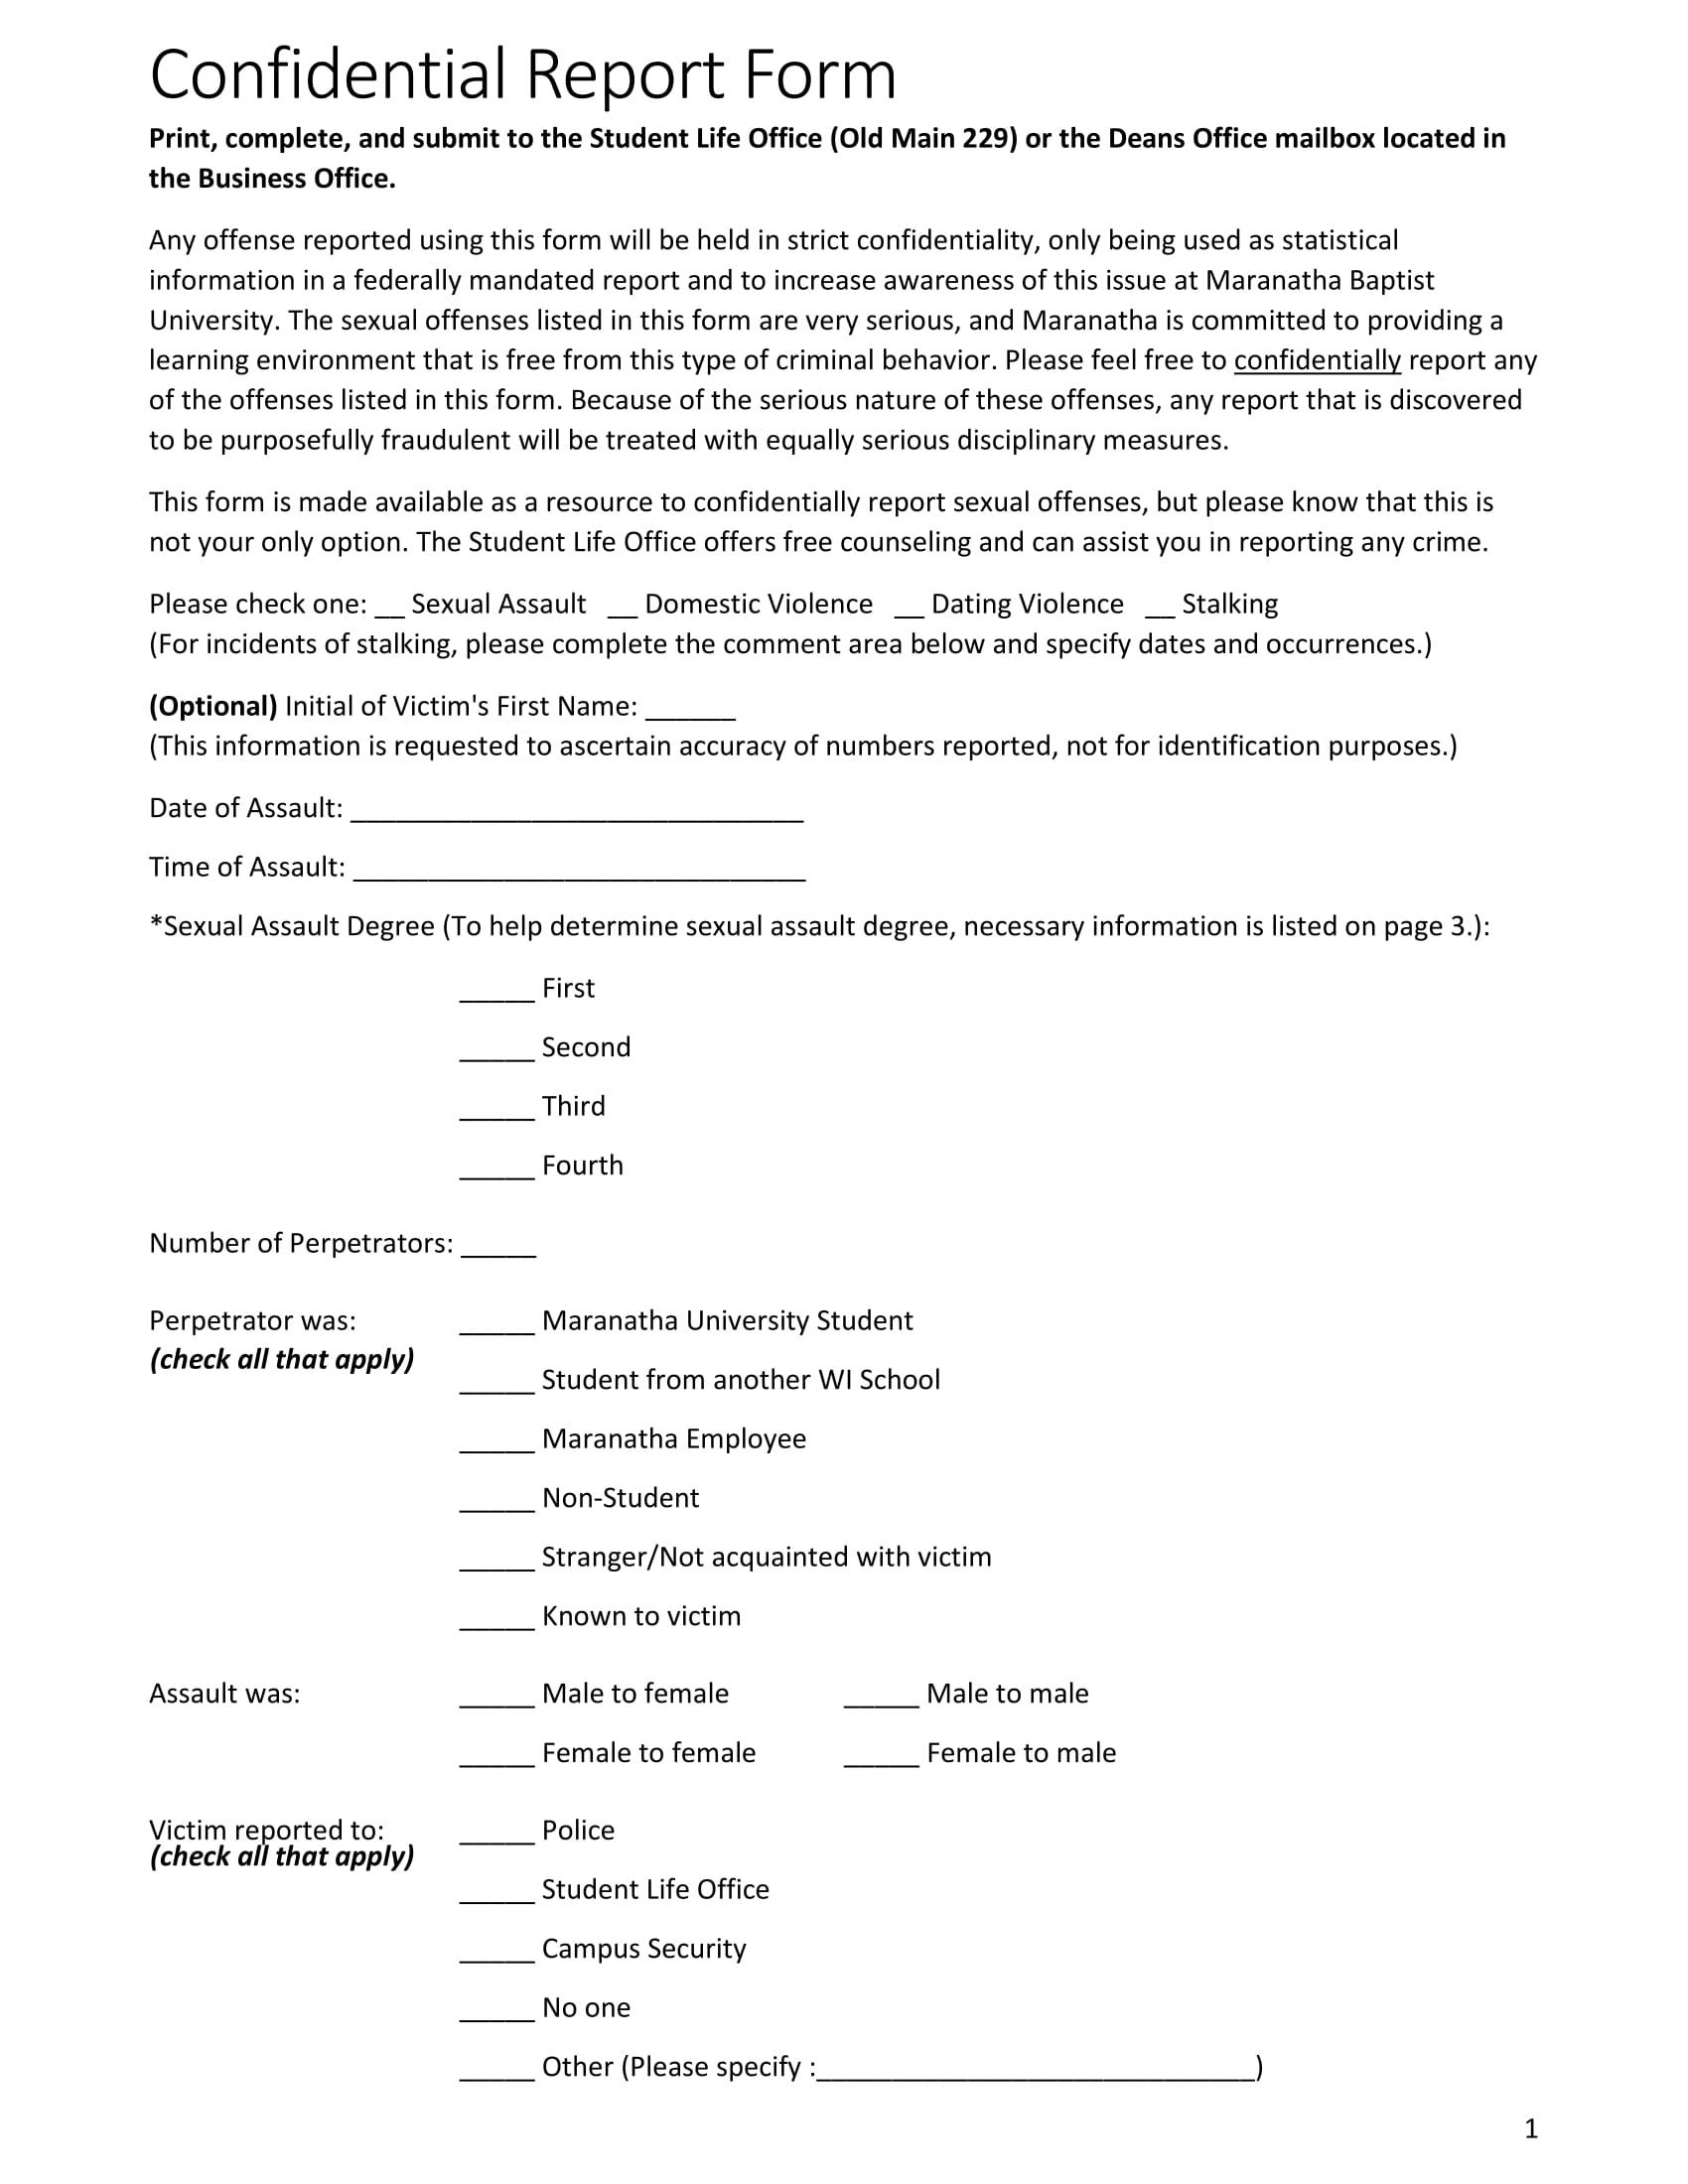 sample confidential report form 1